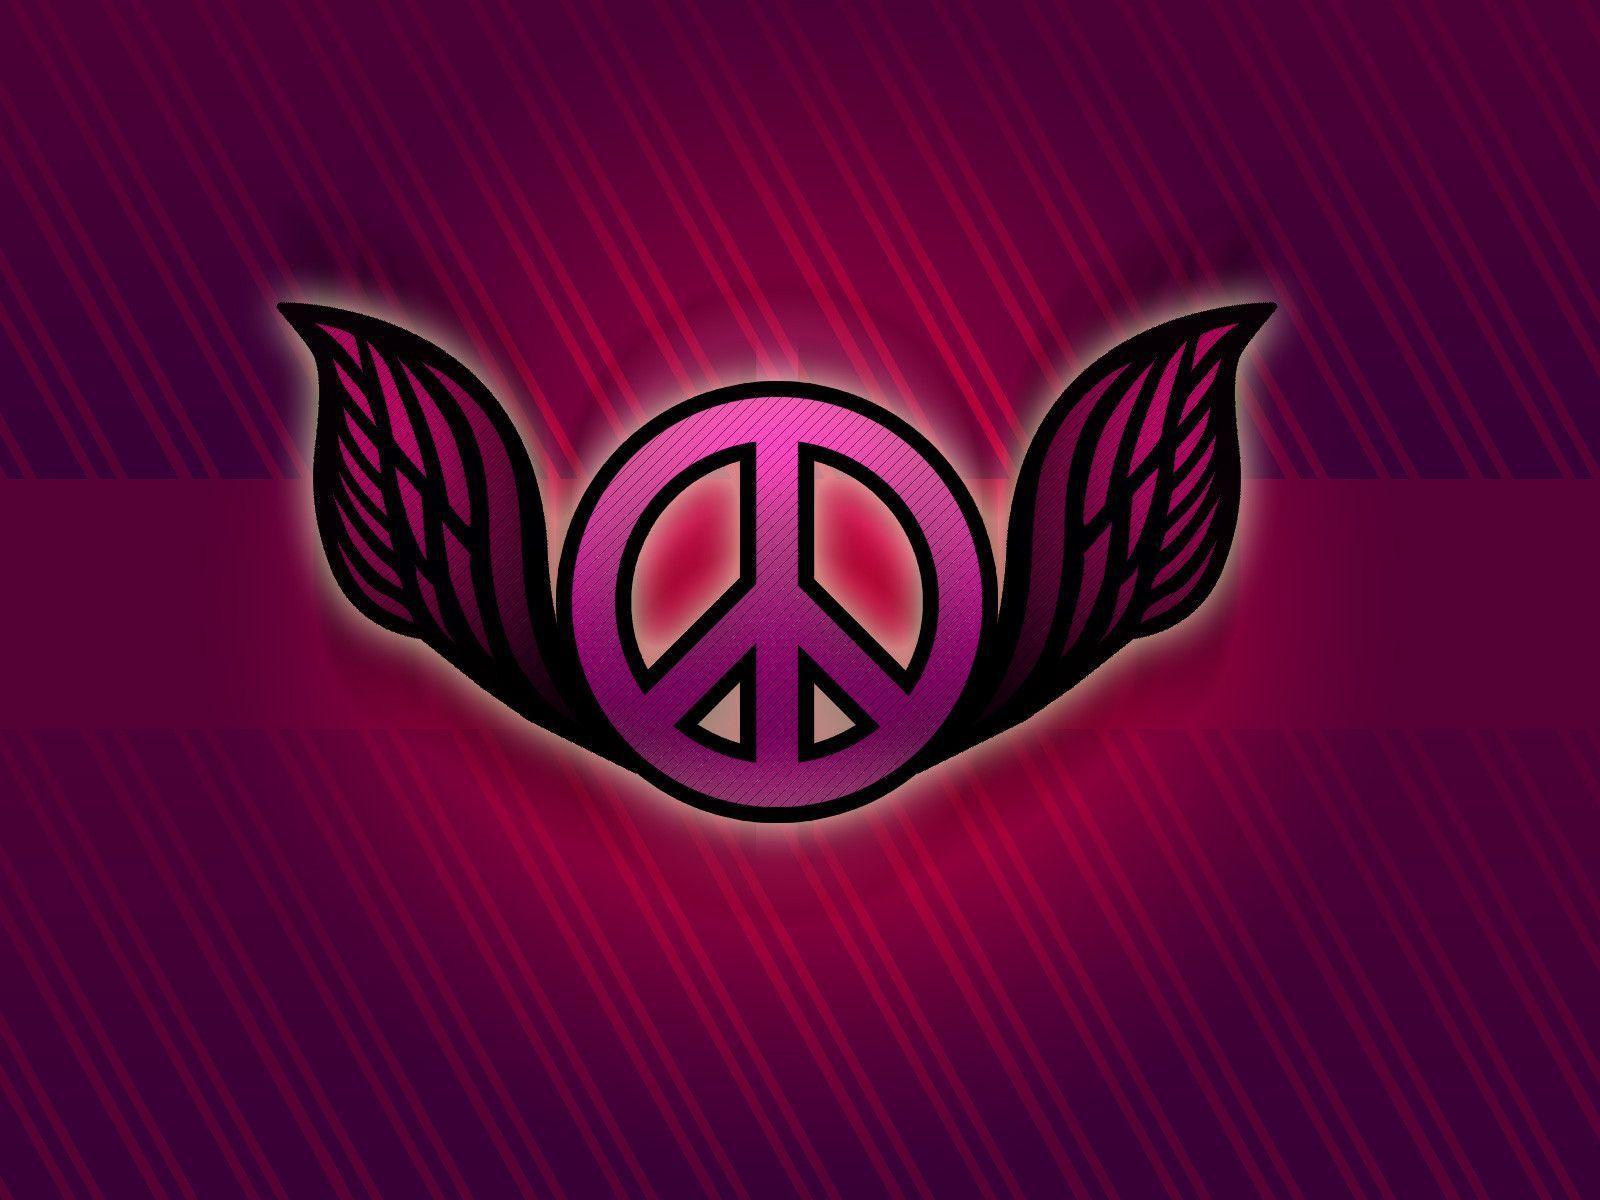 Peace Sign Backgrounds For Desktop 1600x1200